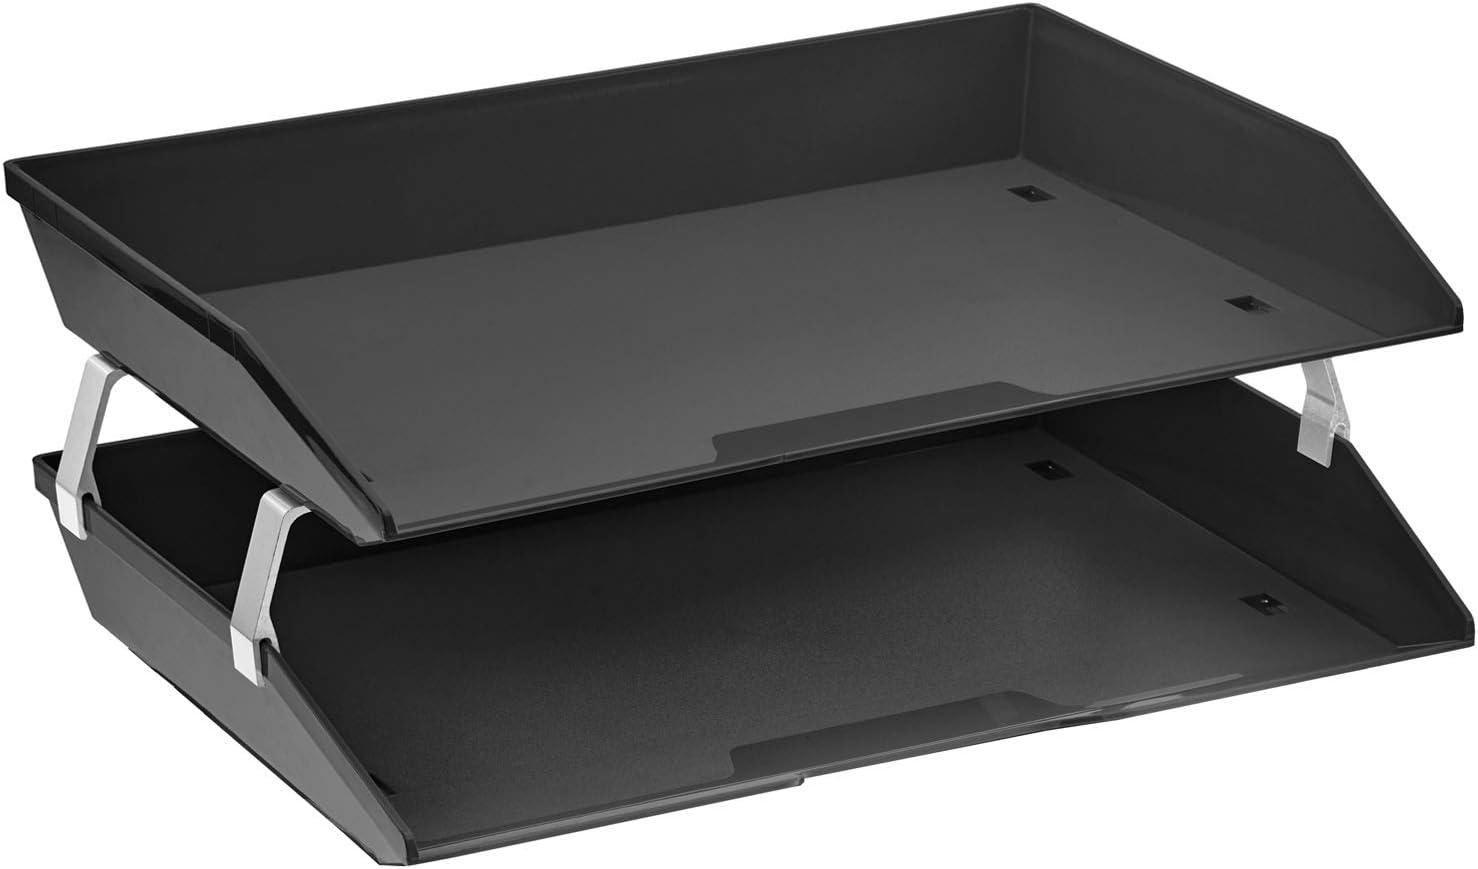 Acrimet Facility 2 Tier Letter Tray Side Load Plastic Desktop File Organizer (Black Color)